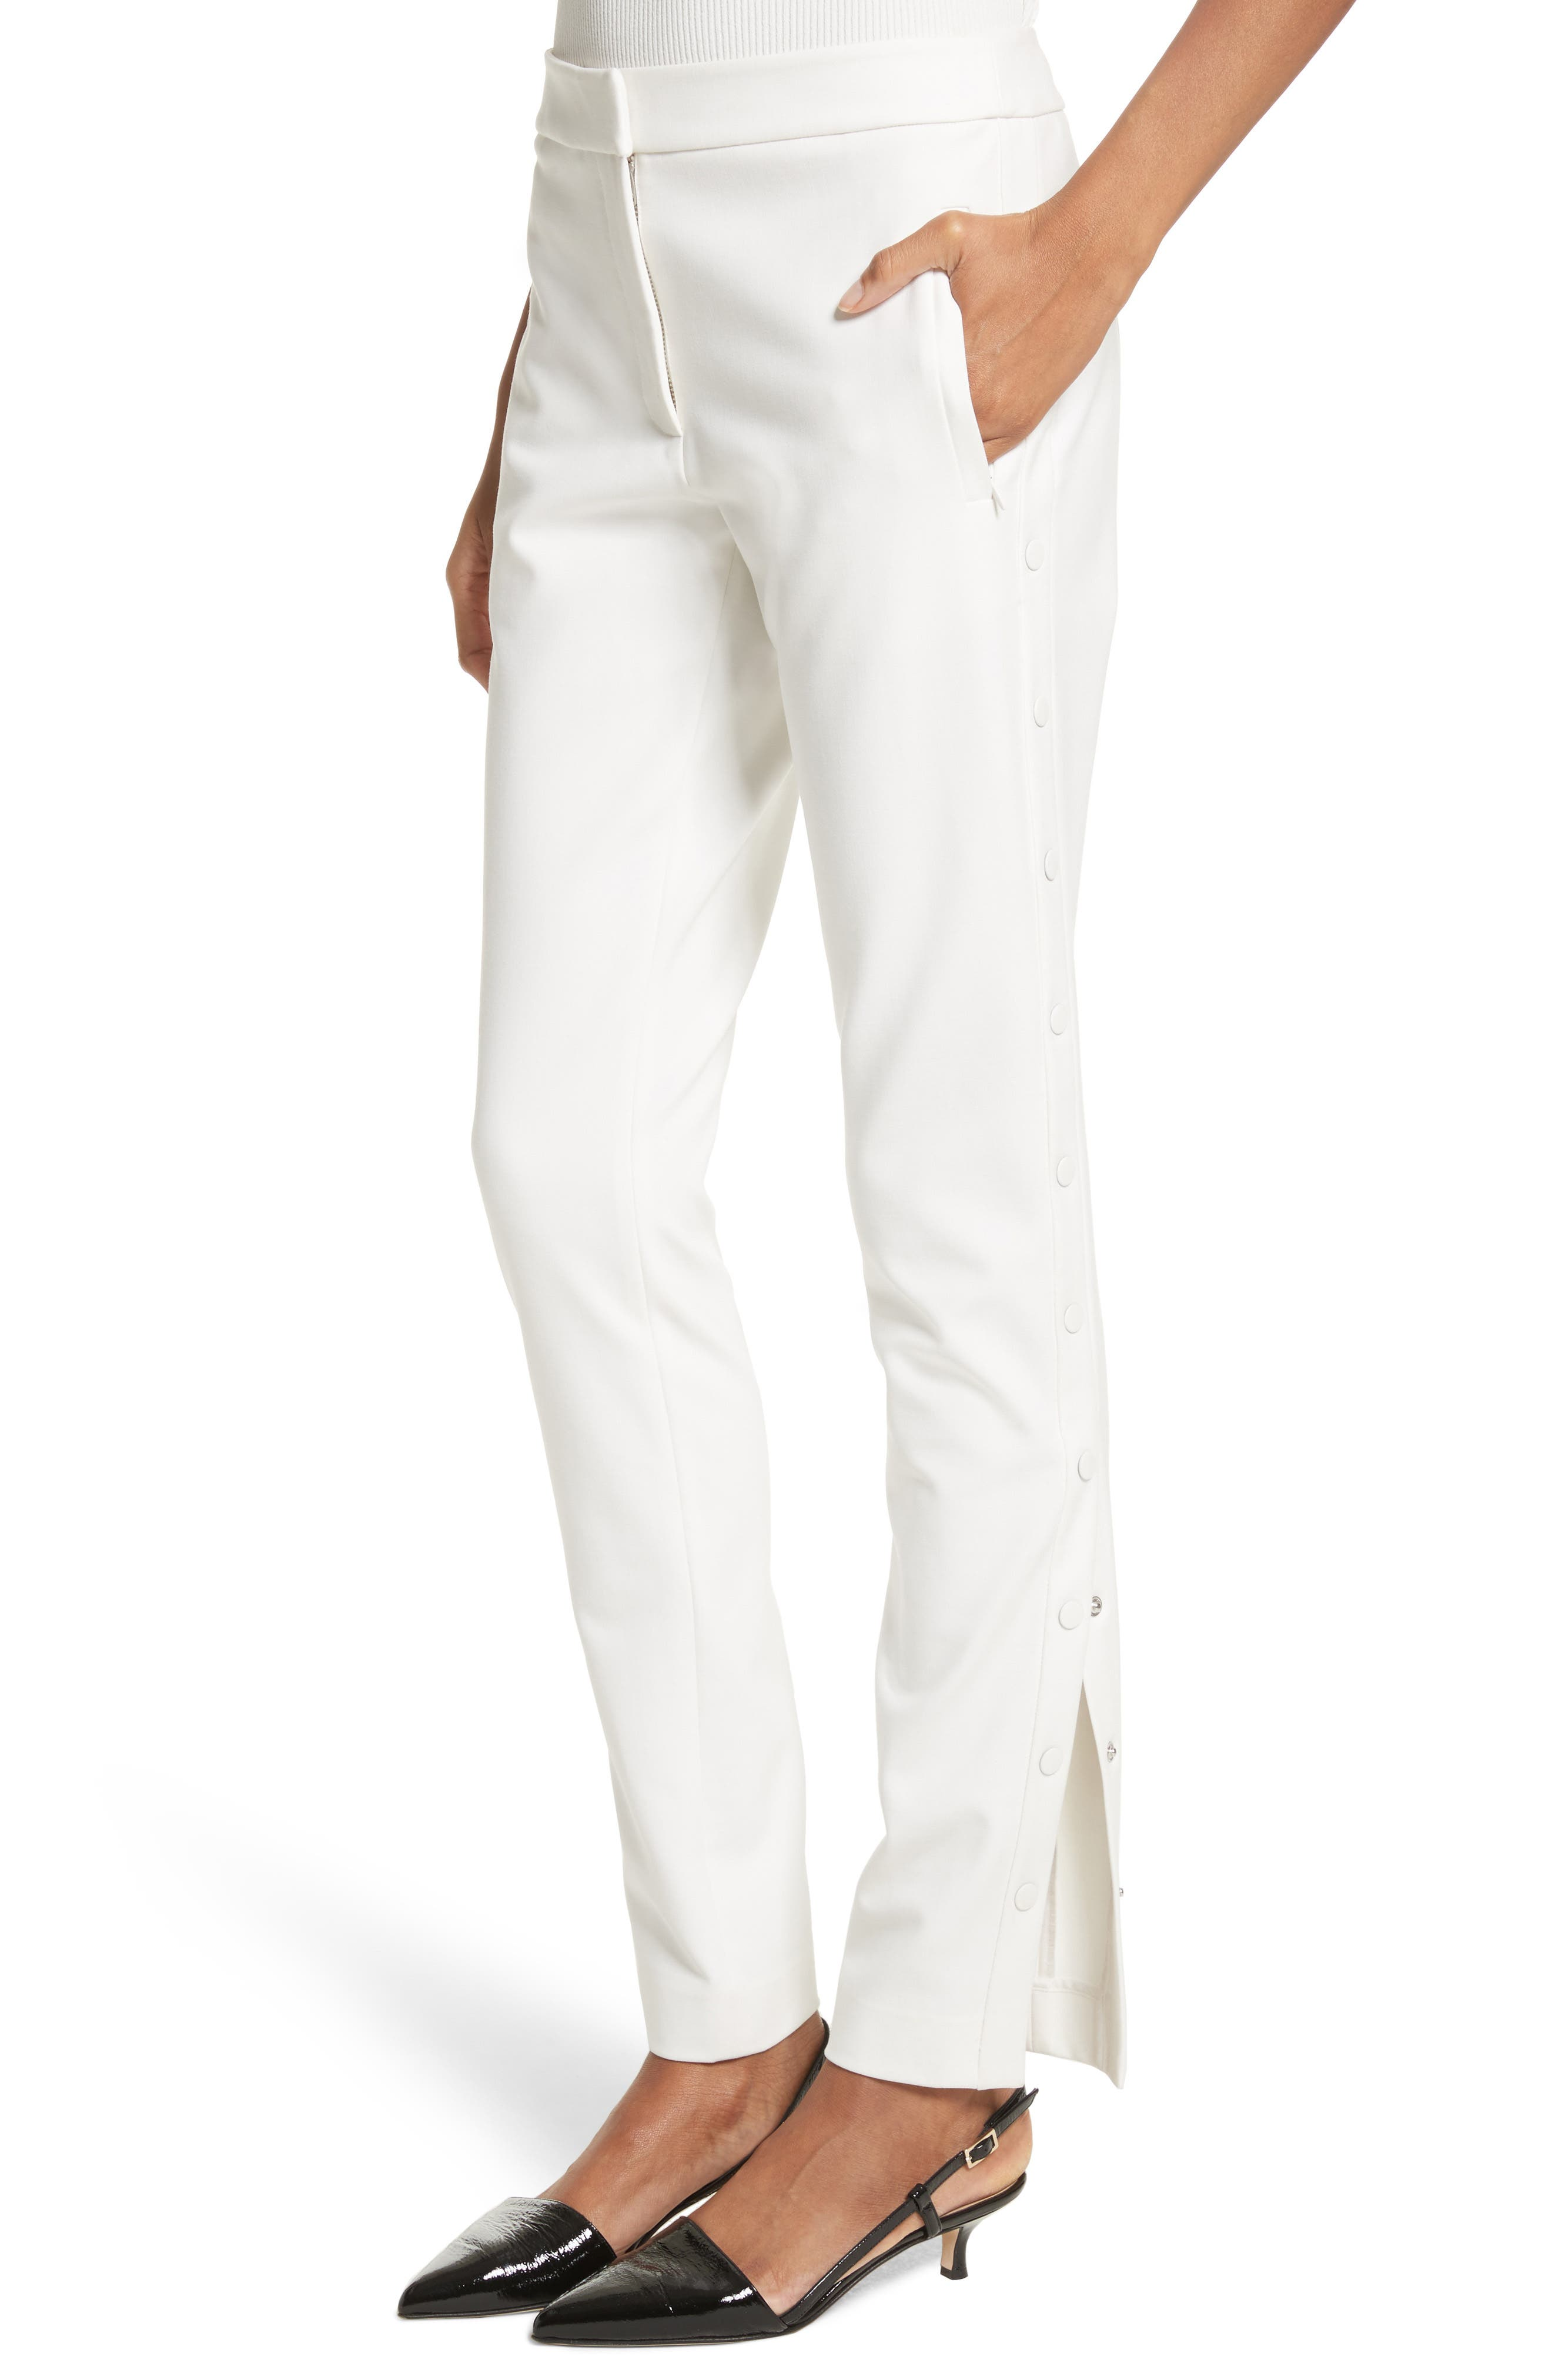 Anson Snap Side Skinny Pants,                             Alternate thumbnail 4, color,                             Ivory